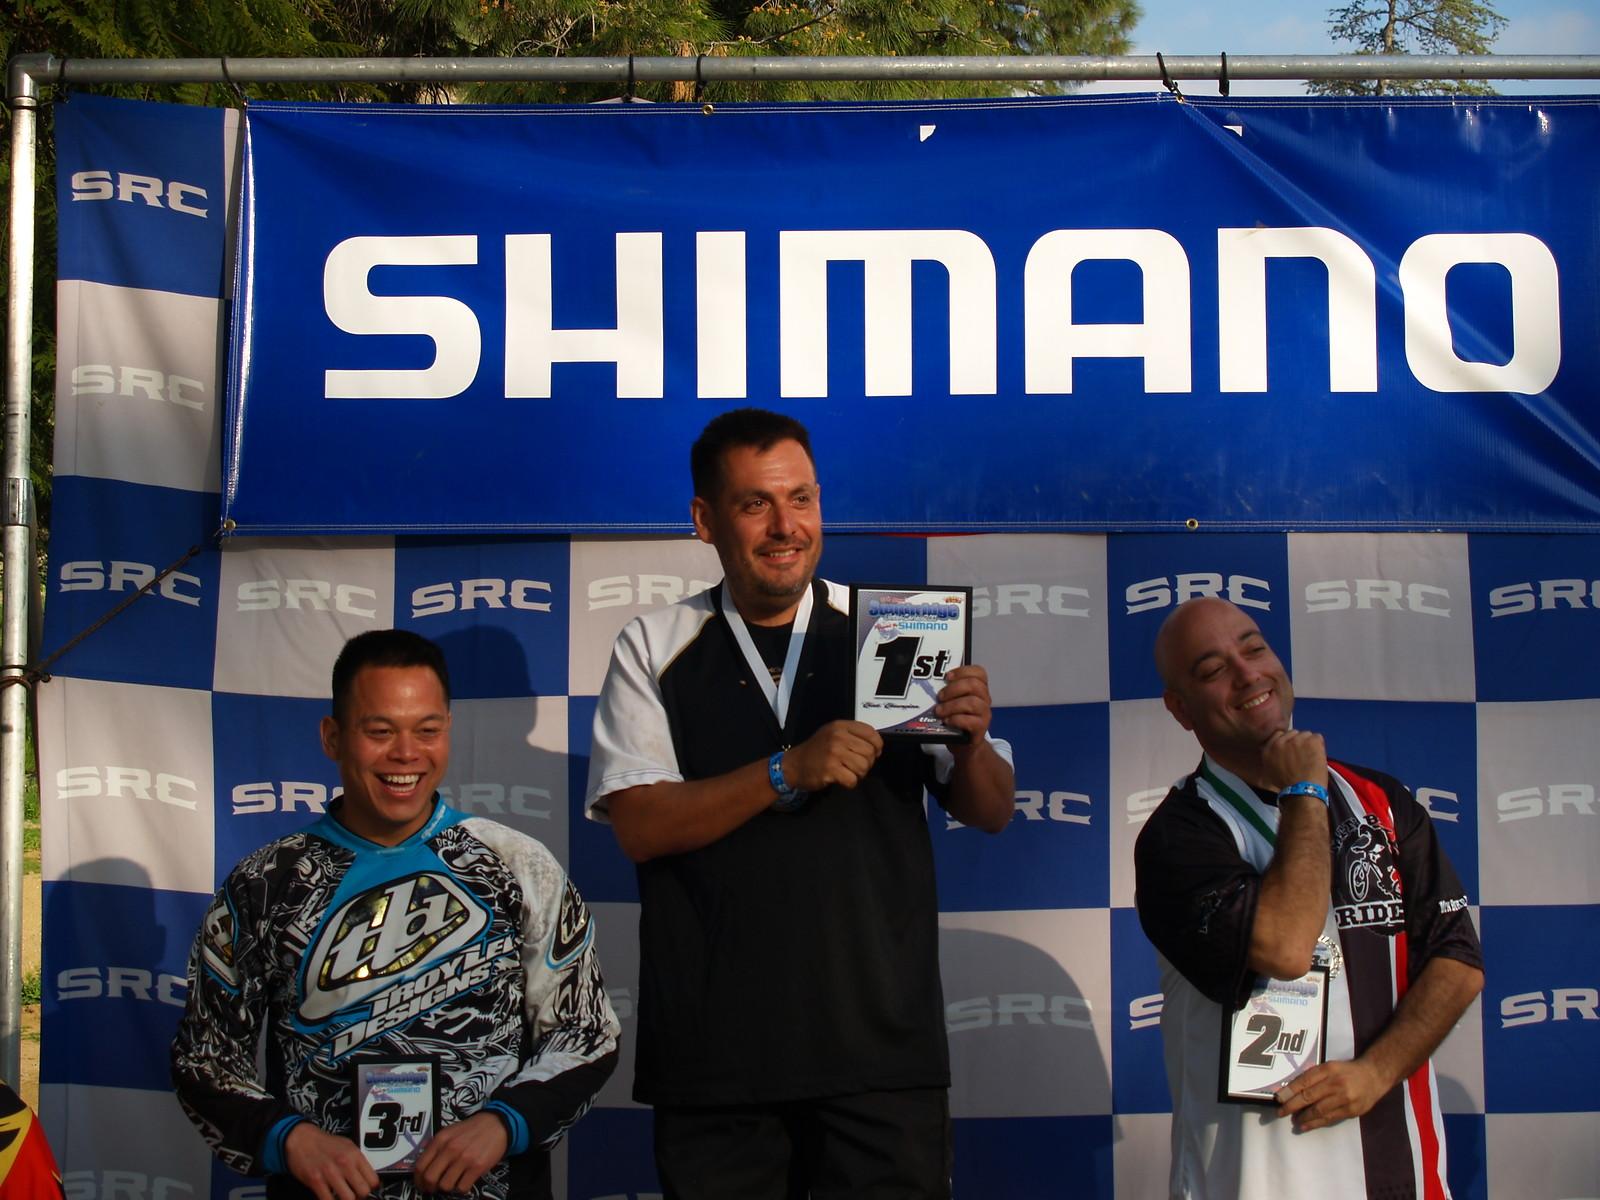 Erwins 2011 SRC Winter Series Overall podium - erwinmruiz - Mountain Biking Pictures - Vital MTB